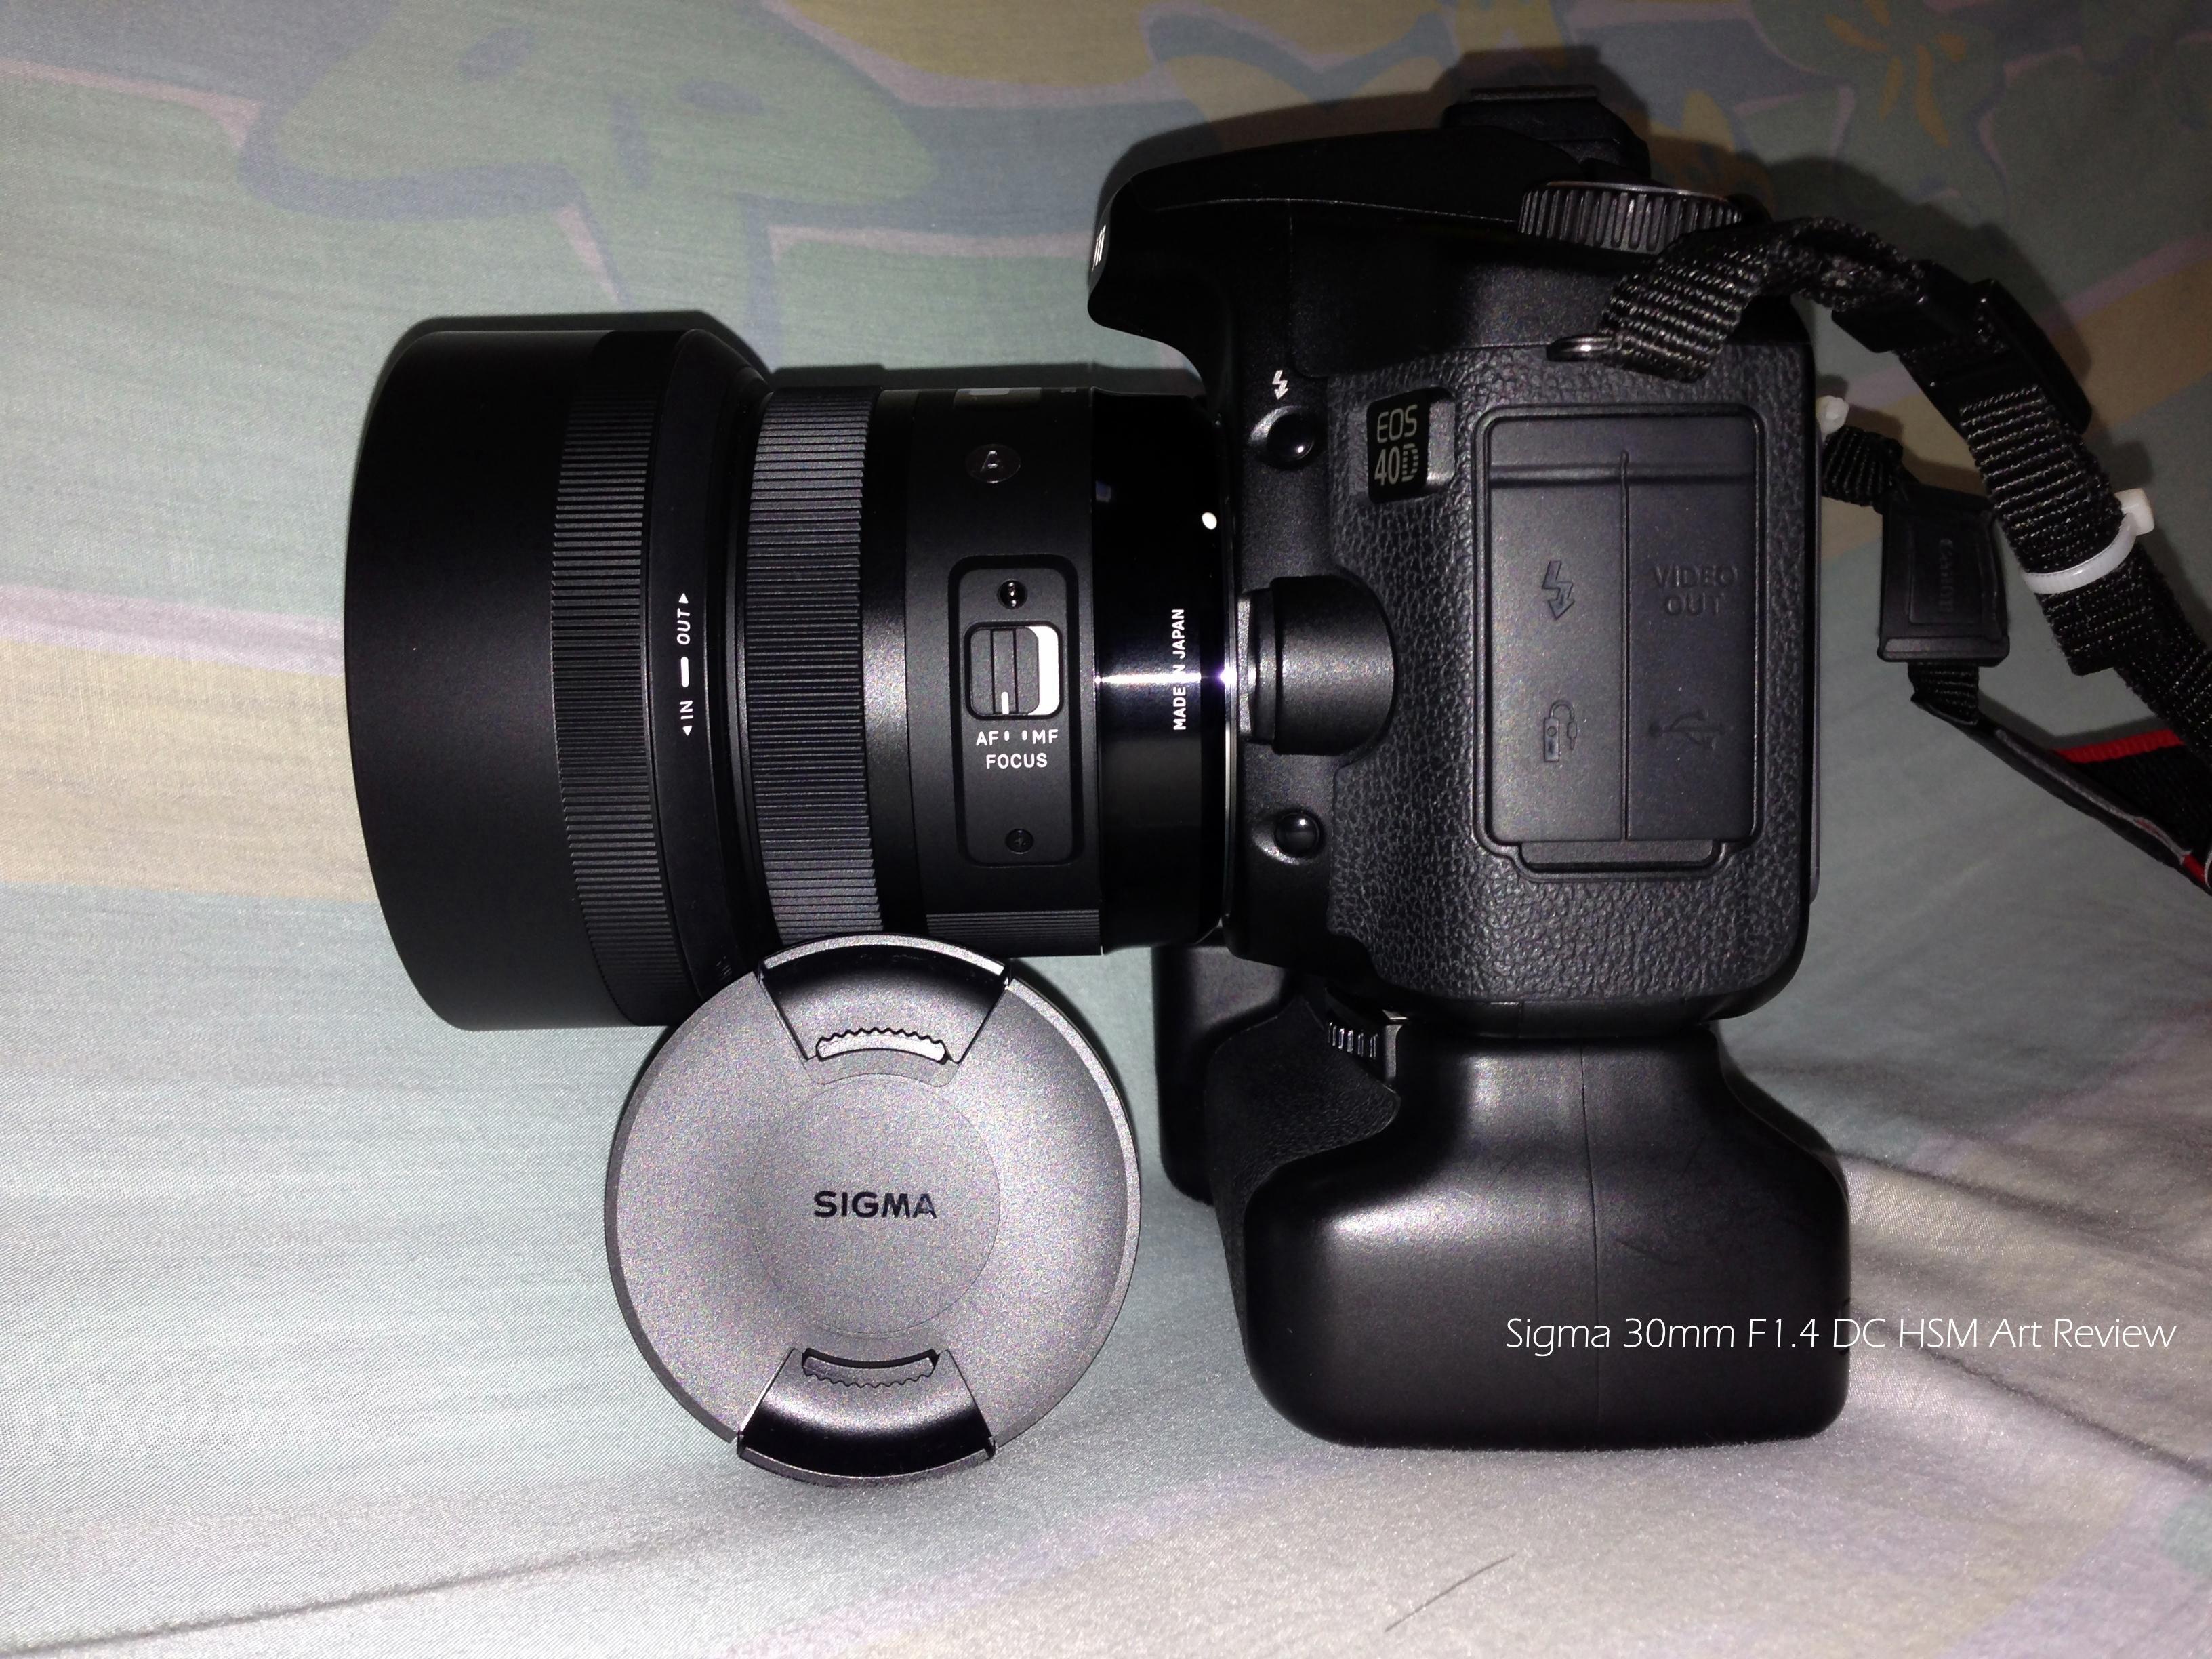 2013 Sigma 30mm F1.4 DC HSM ART Review   SHUTTER JOURNEY SINGAPORE